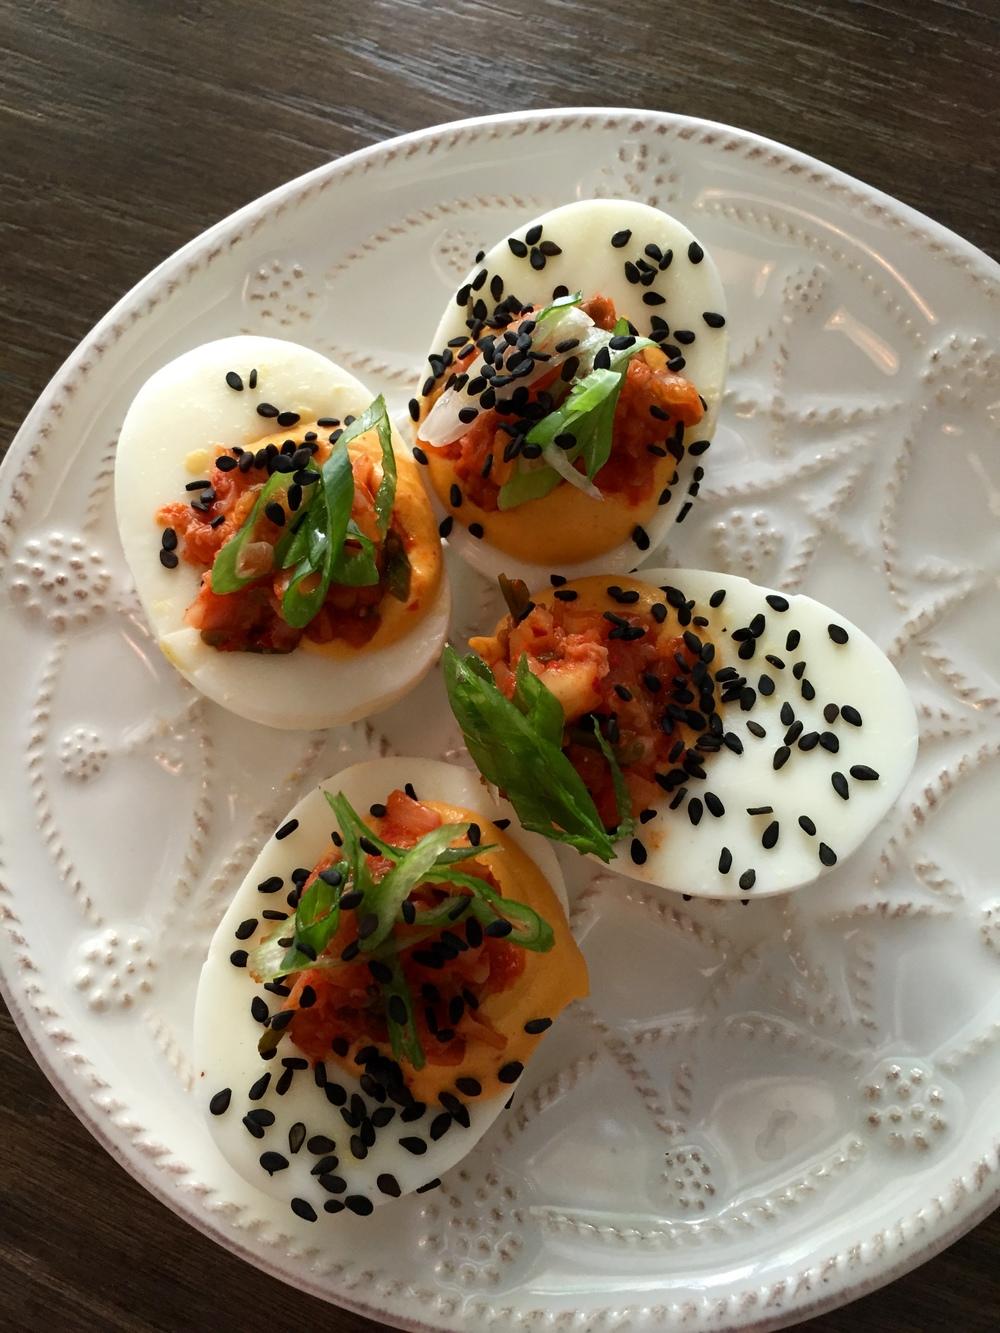 Deviled Jidori Eggs with Korean chili and kimchee.